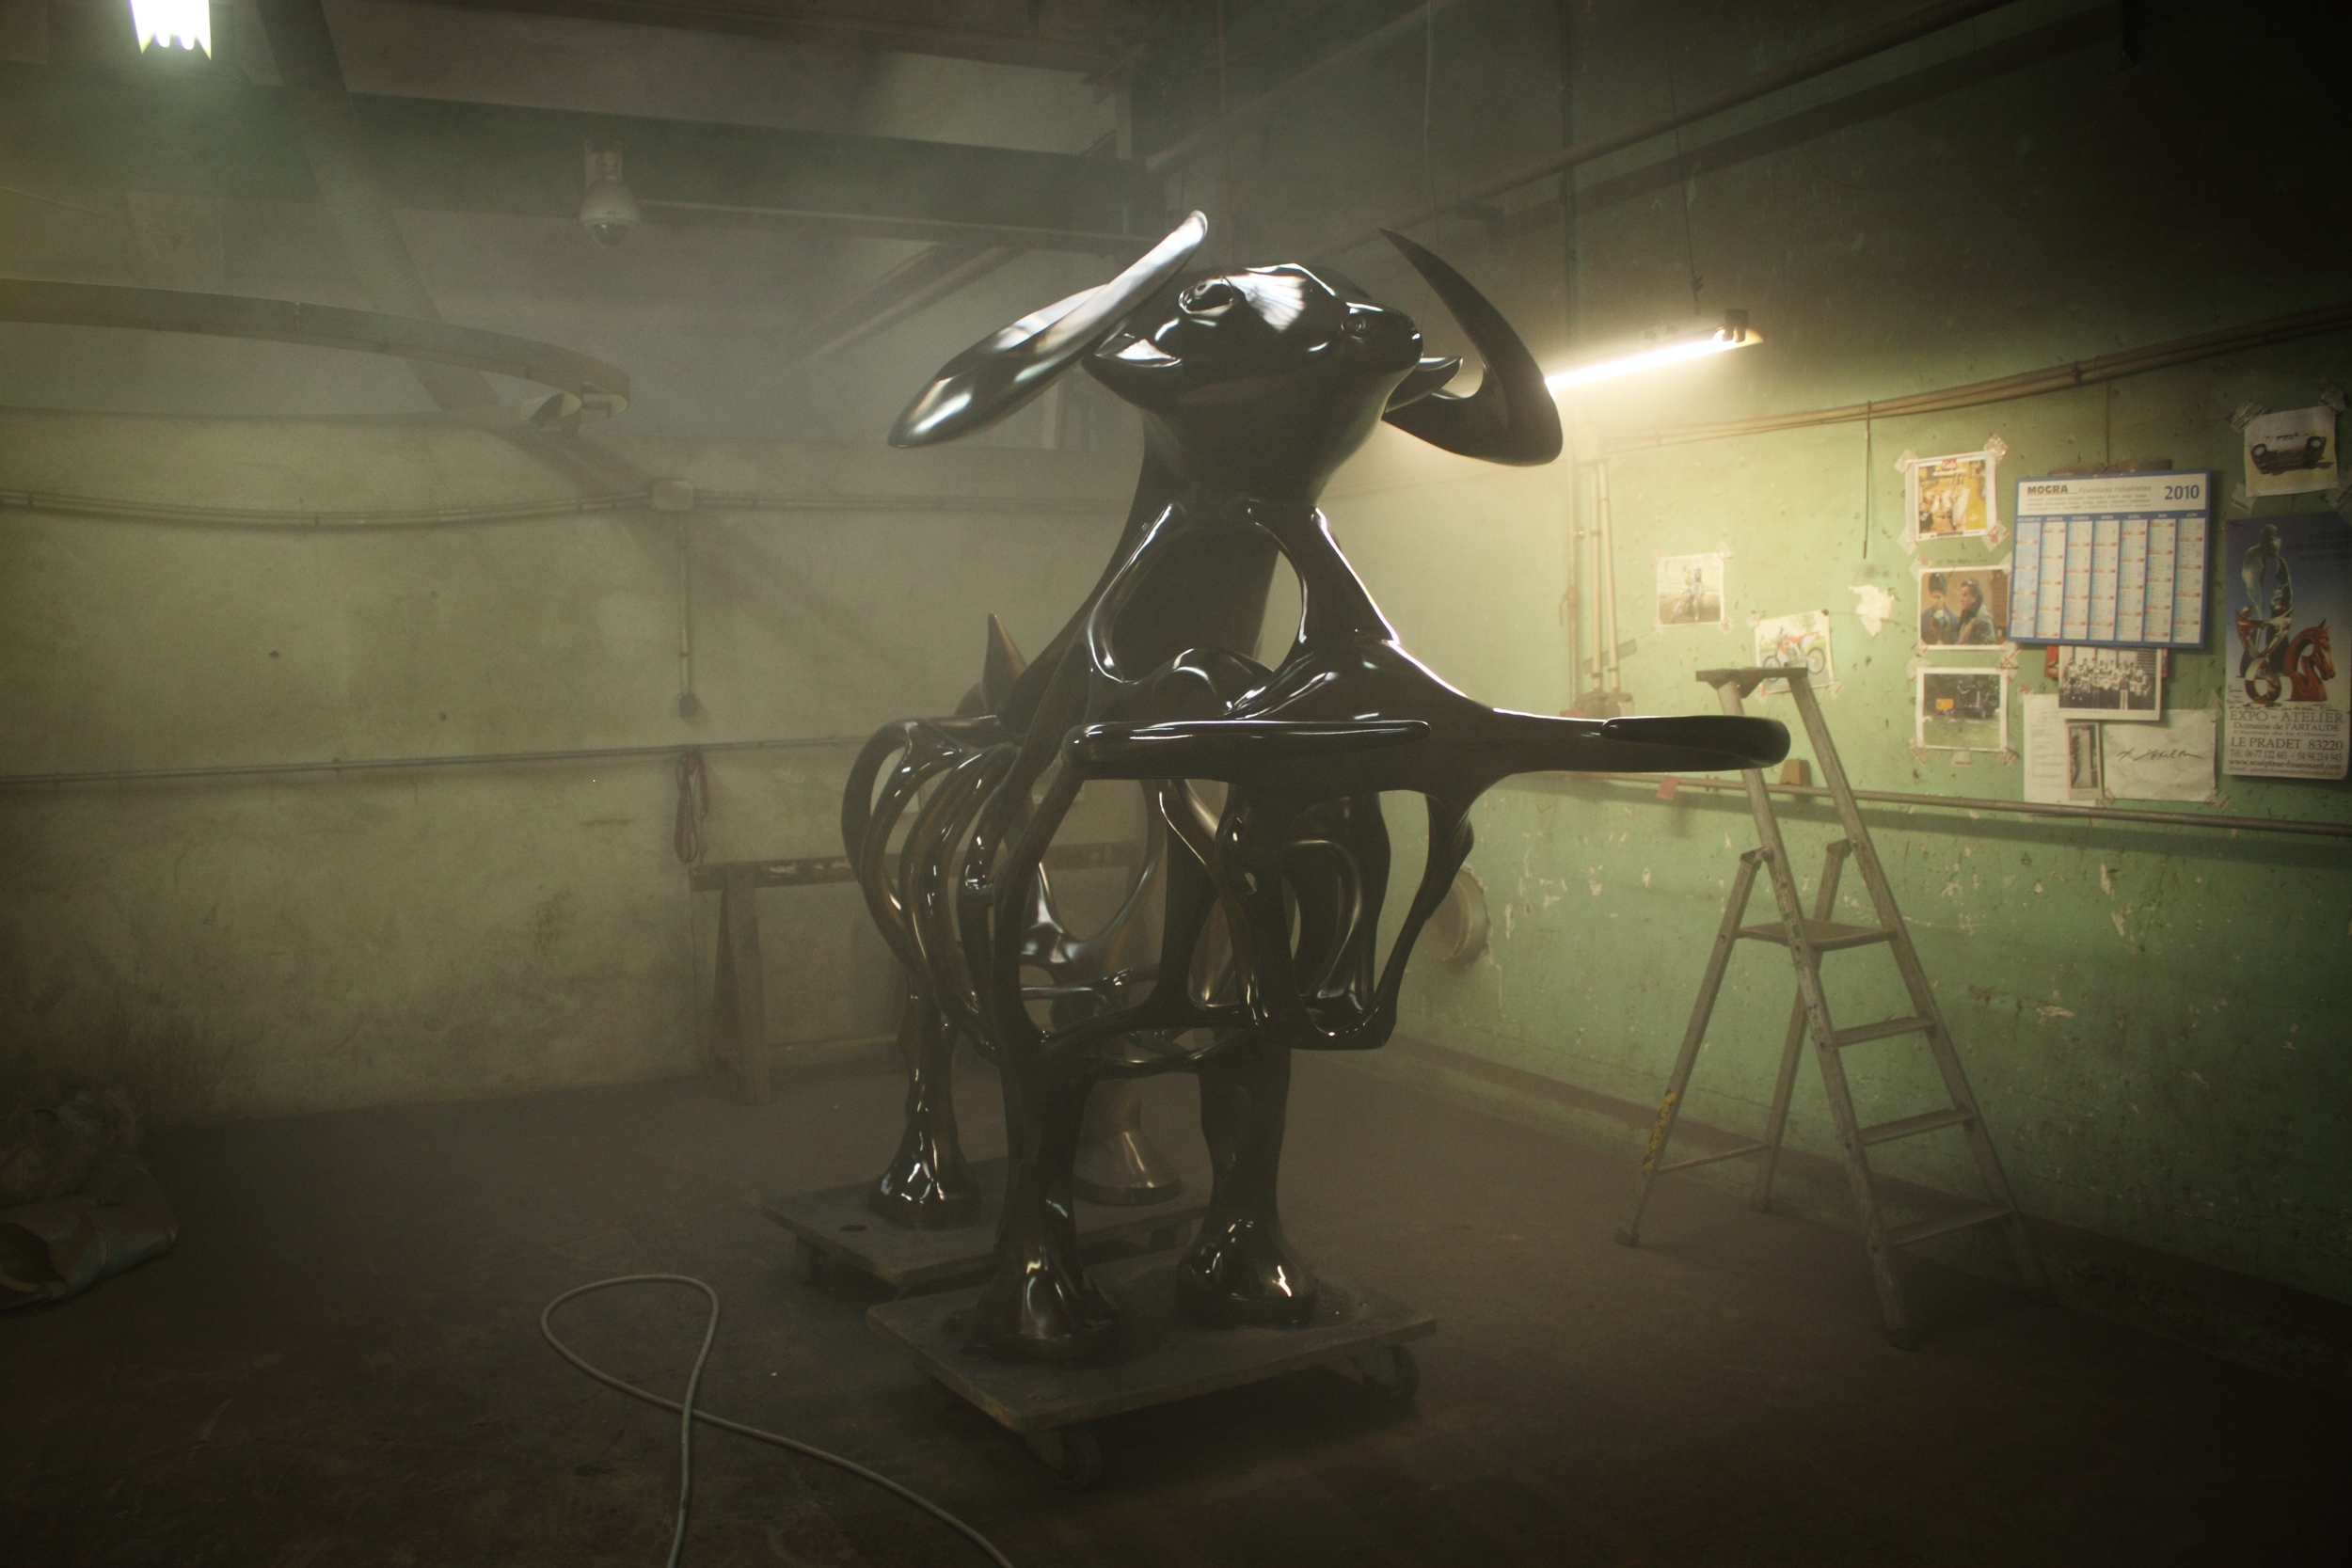 Richard Texier fonderie - Bronze casting